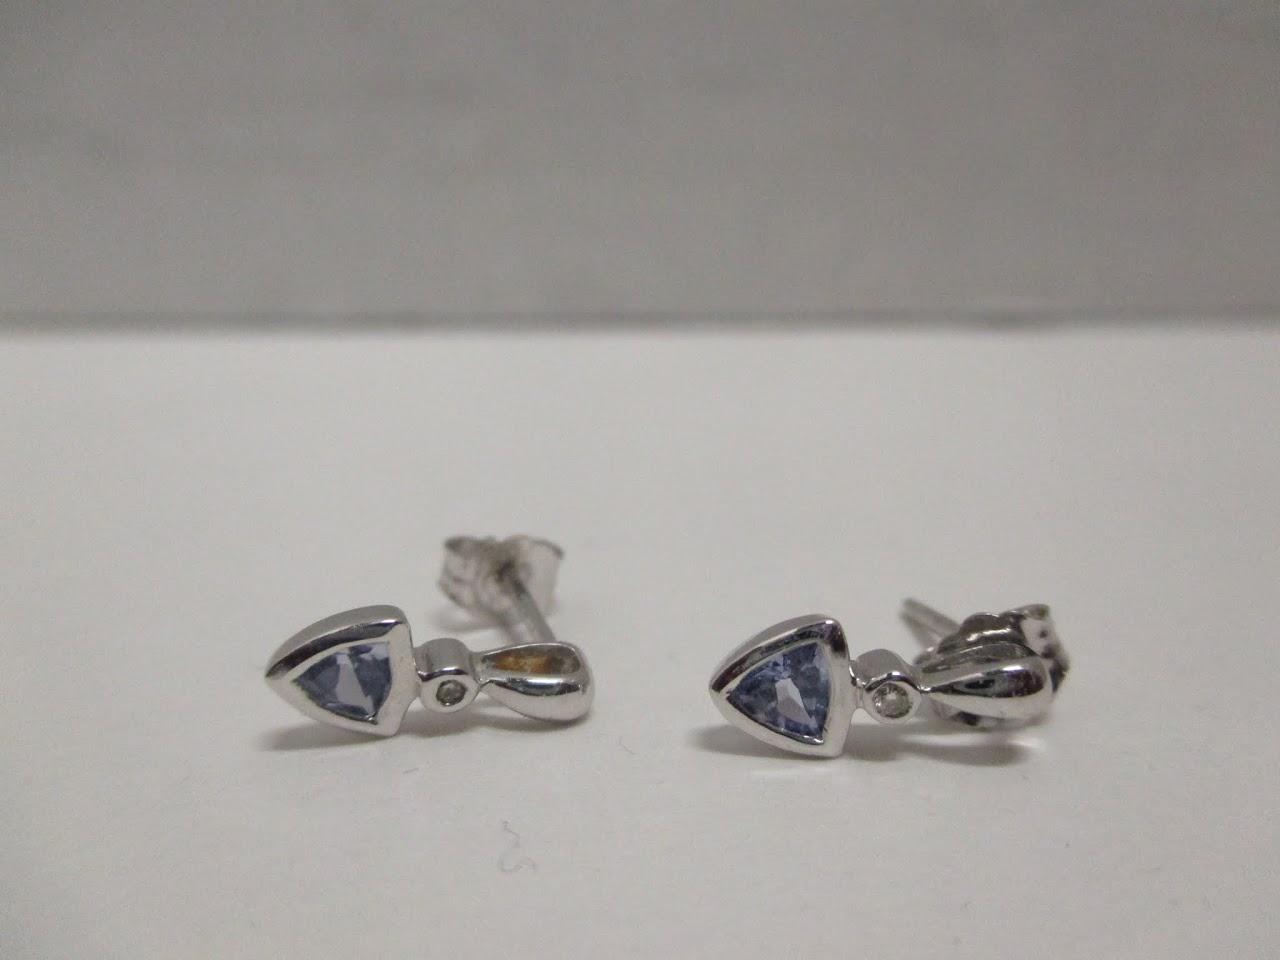 14k and Stone Earrings